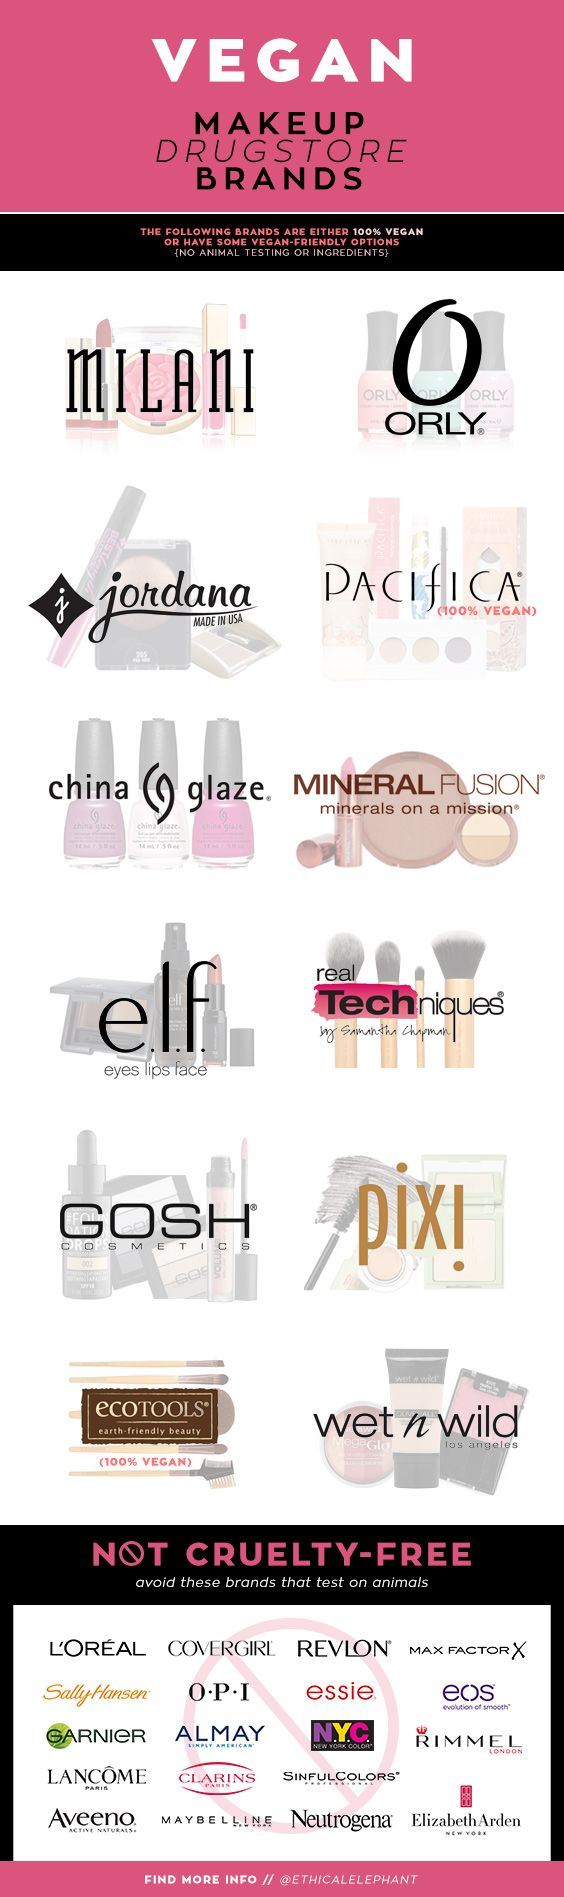 CrueltyFree & Vegan Makeup Affordable Drugstore Brands